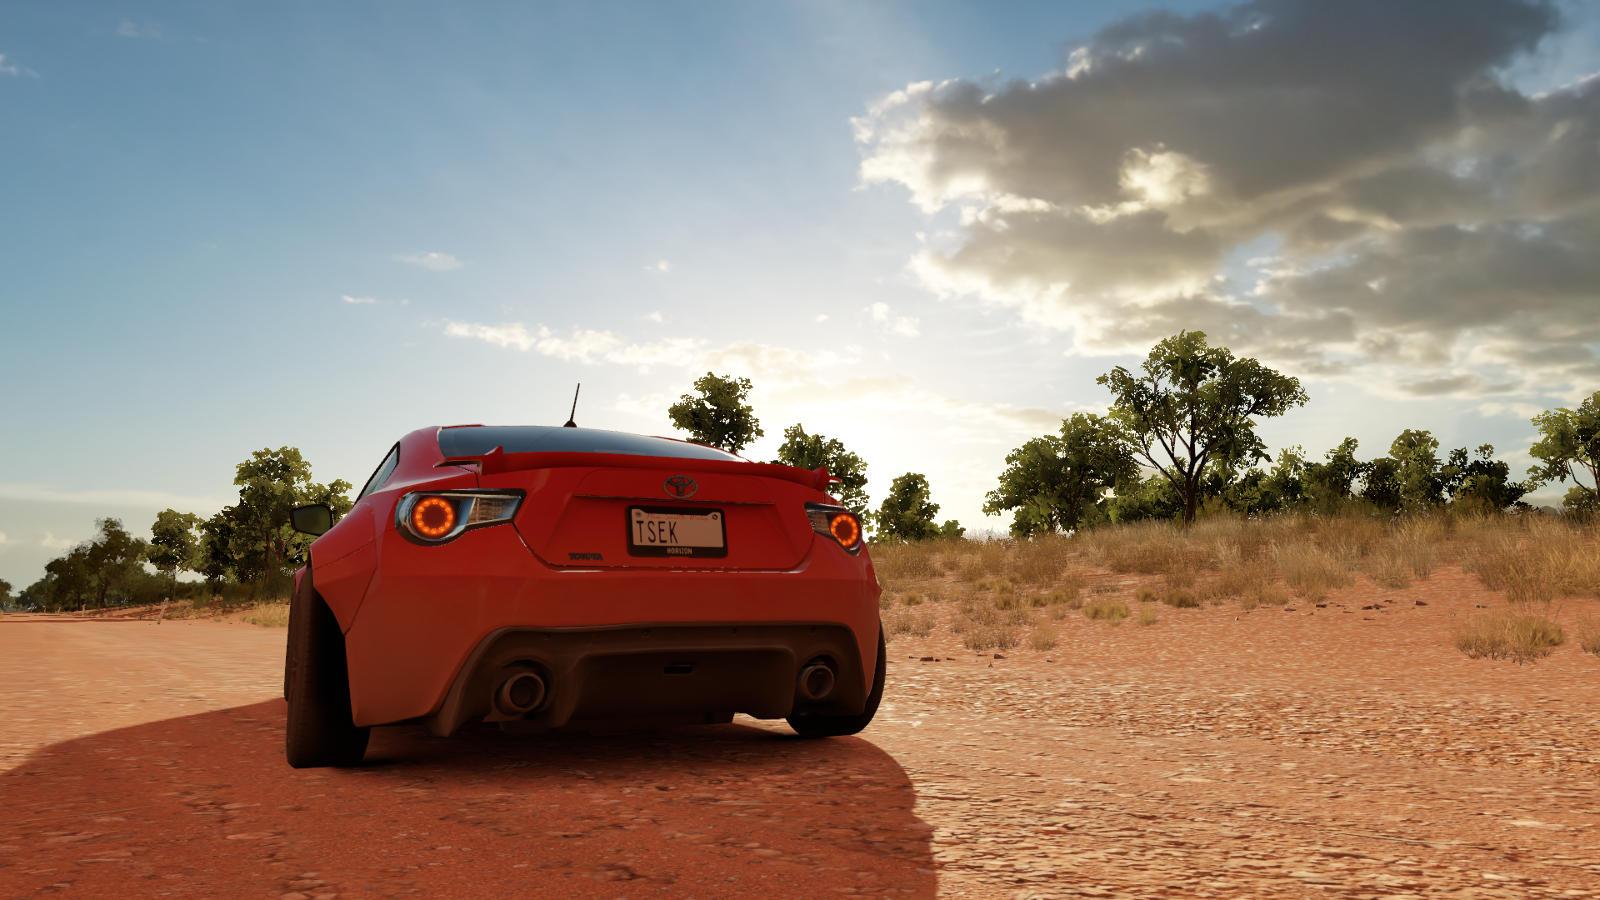 Forza Horizon 3 drone mode